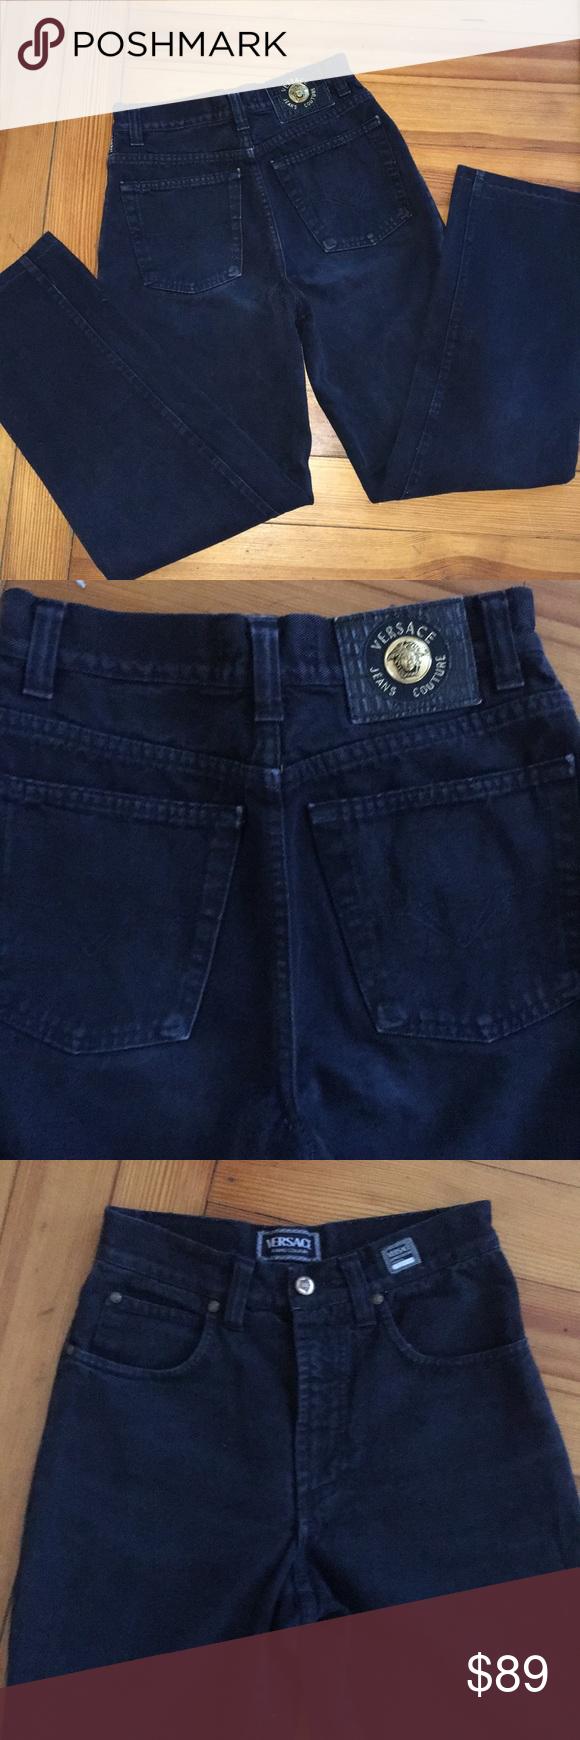 1be4ec08043e1c Versace Jeans Couture Vintage High Waist Jeans 👖 Inseam 29